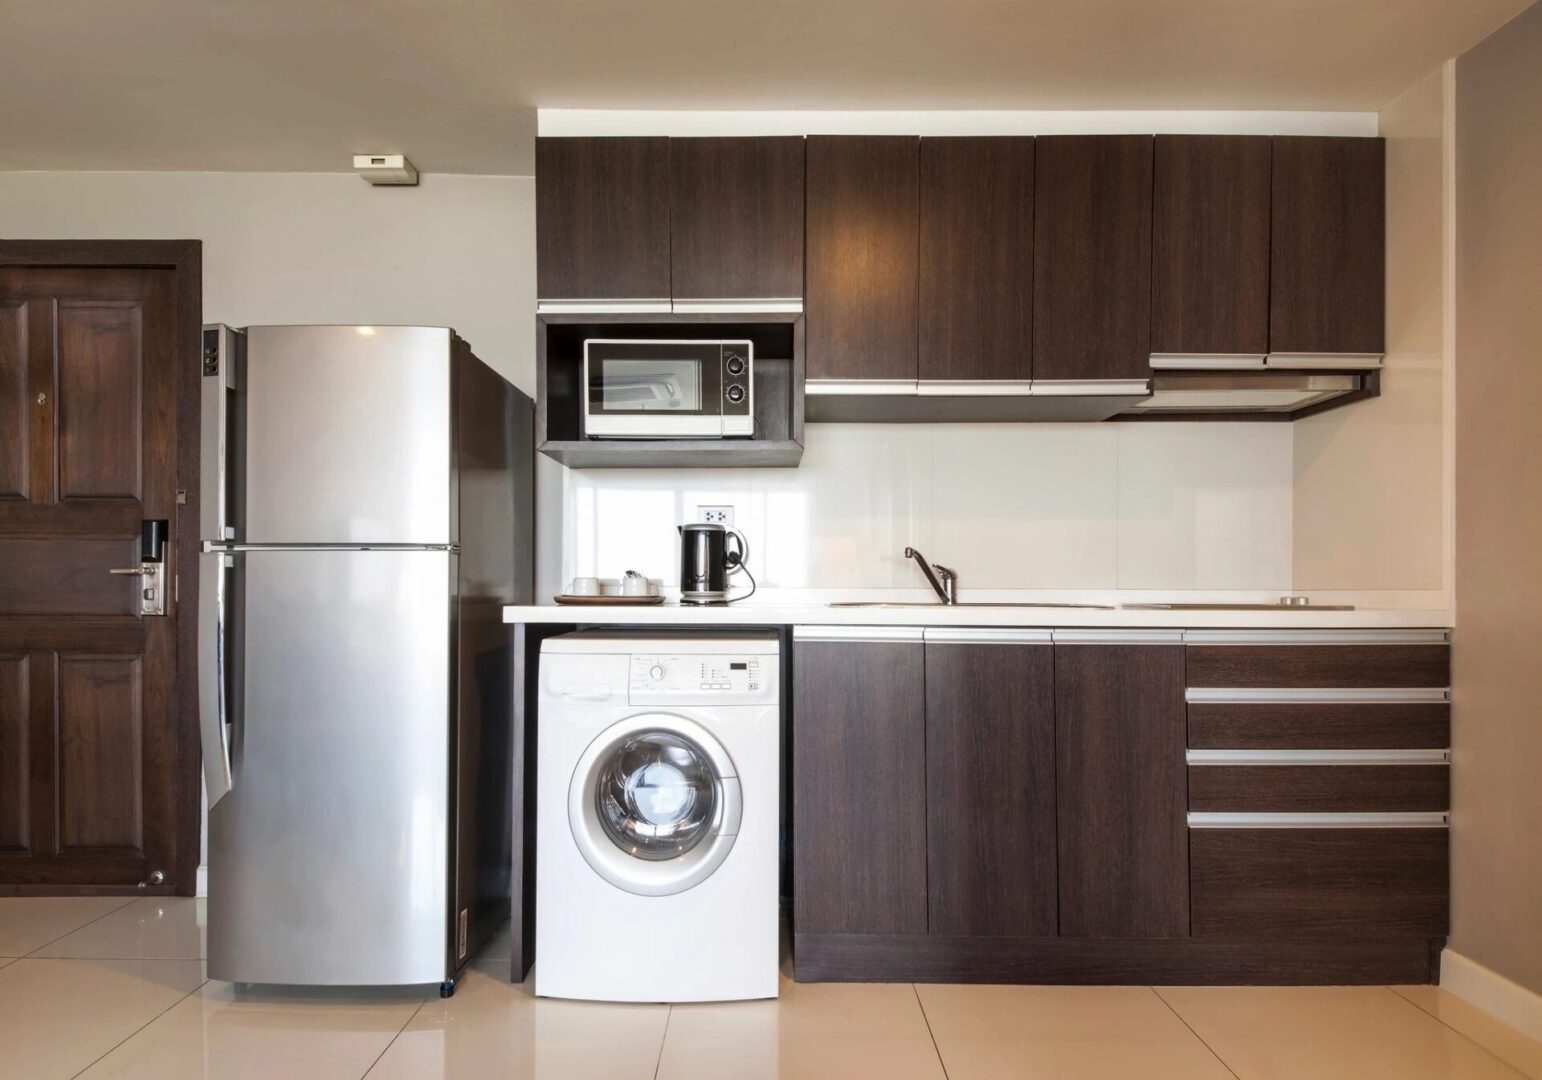 Dube Appliance Service